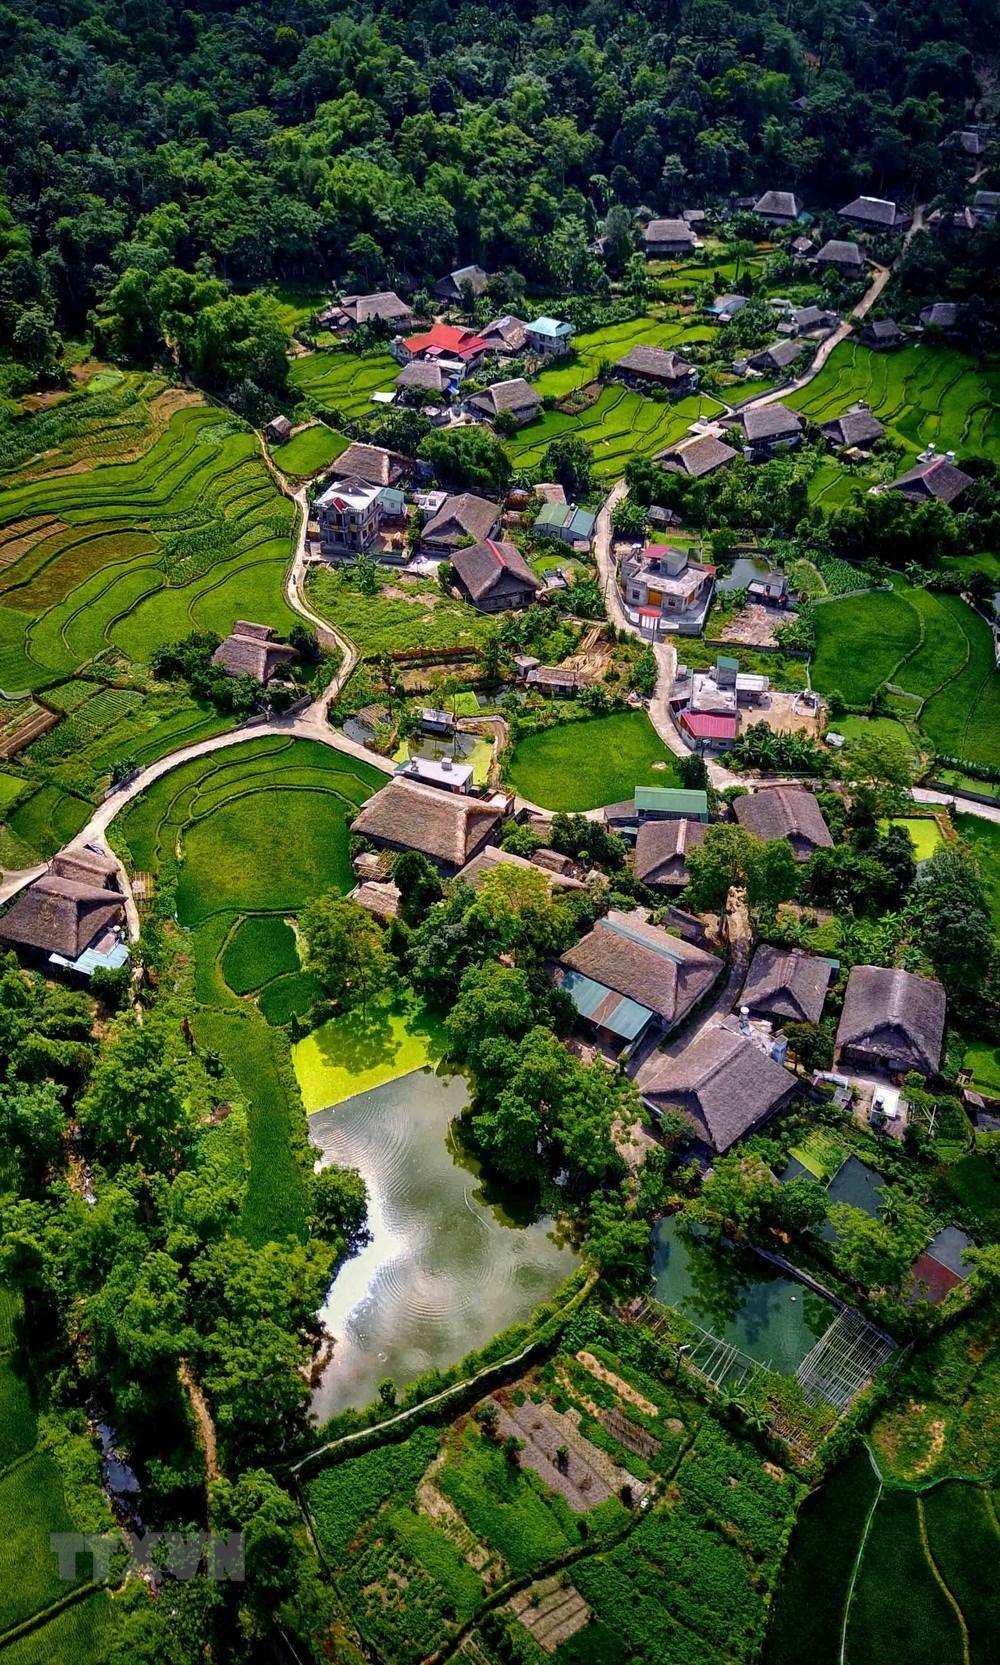 Stunning view, Ha Giang province, natural landscapes, summer destination, untouched natural landscapes, most alluring destinations